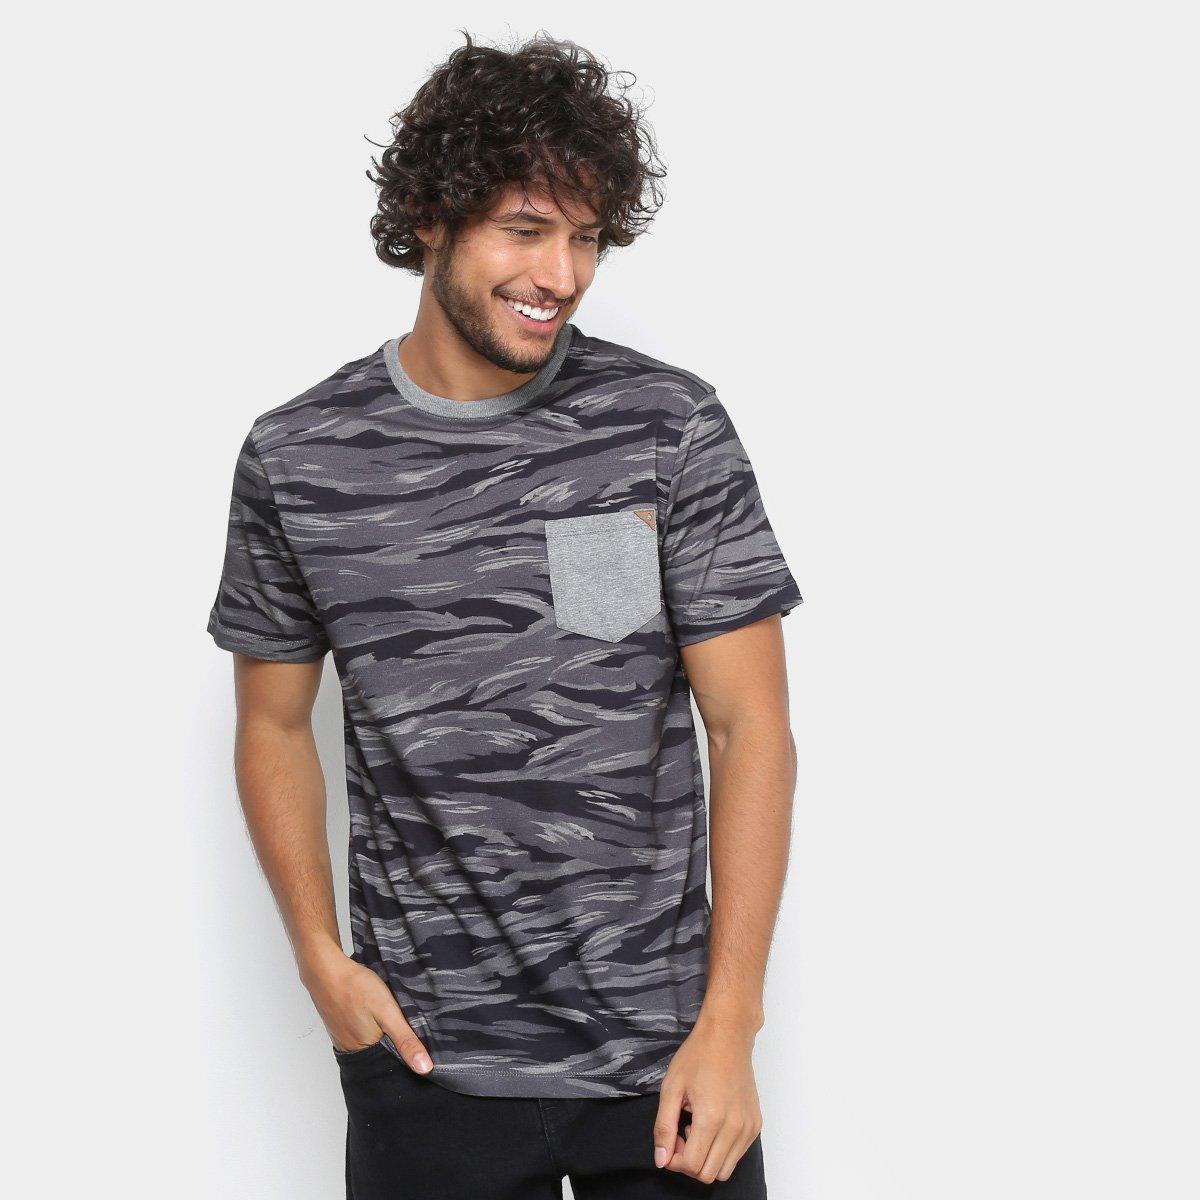 Camiseta MCD Especial Full Camouflage Masculina. undefined f5a68a3ea80